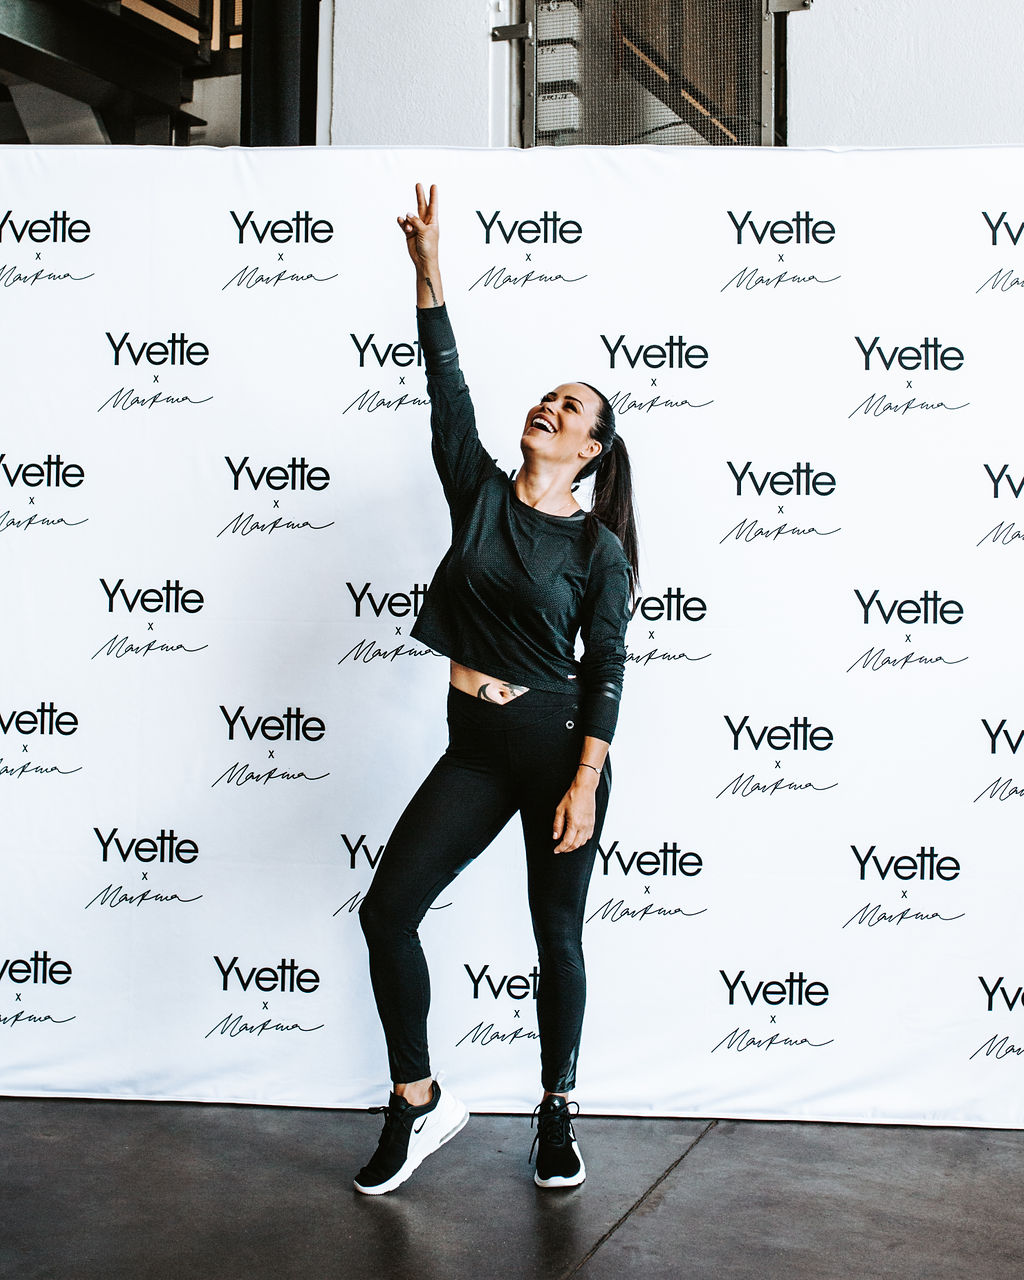 20190515_Yvette_X_Martina_Lili_Nissila-10.jpg